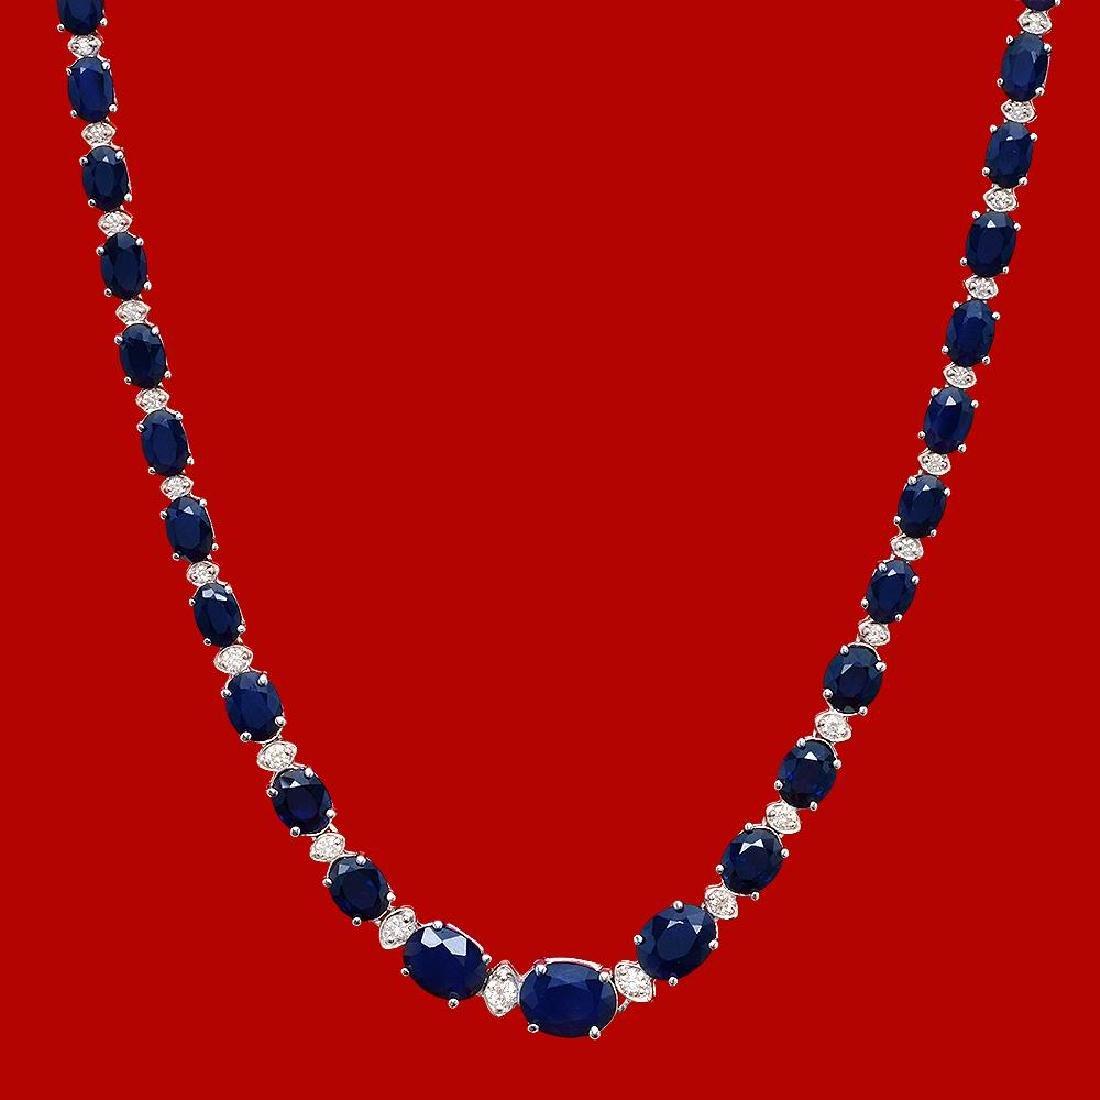 14k Gold 30.19ct Sapphire 1.25ct Diamond Necklace